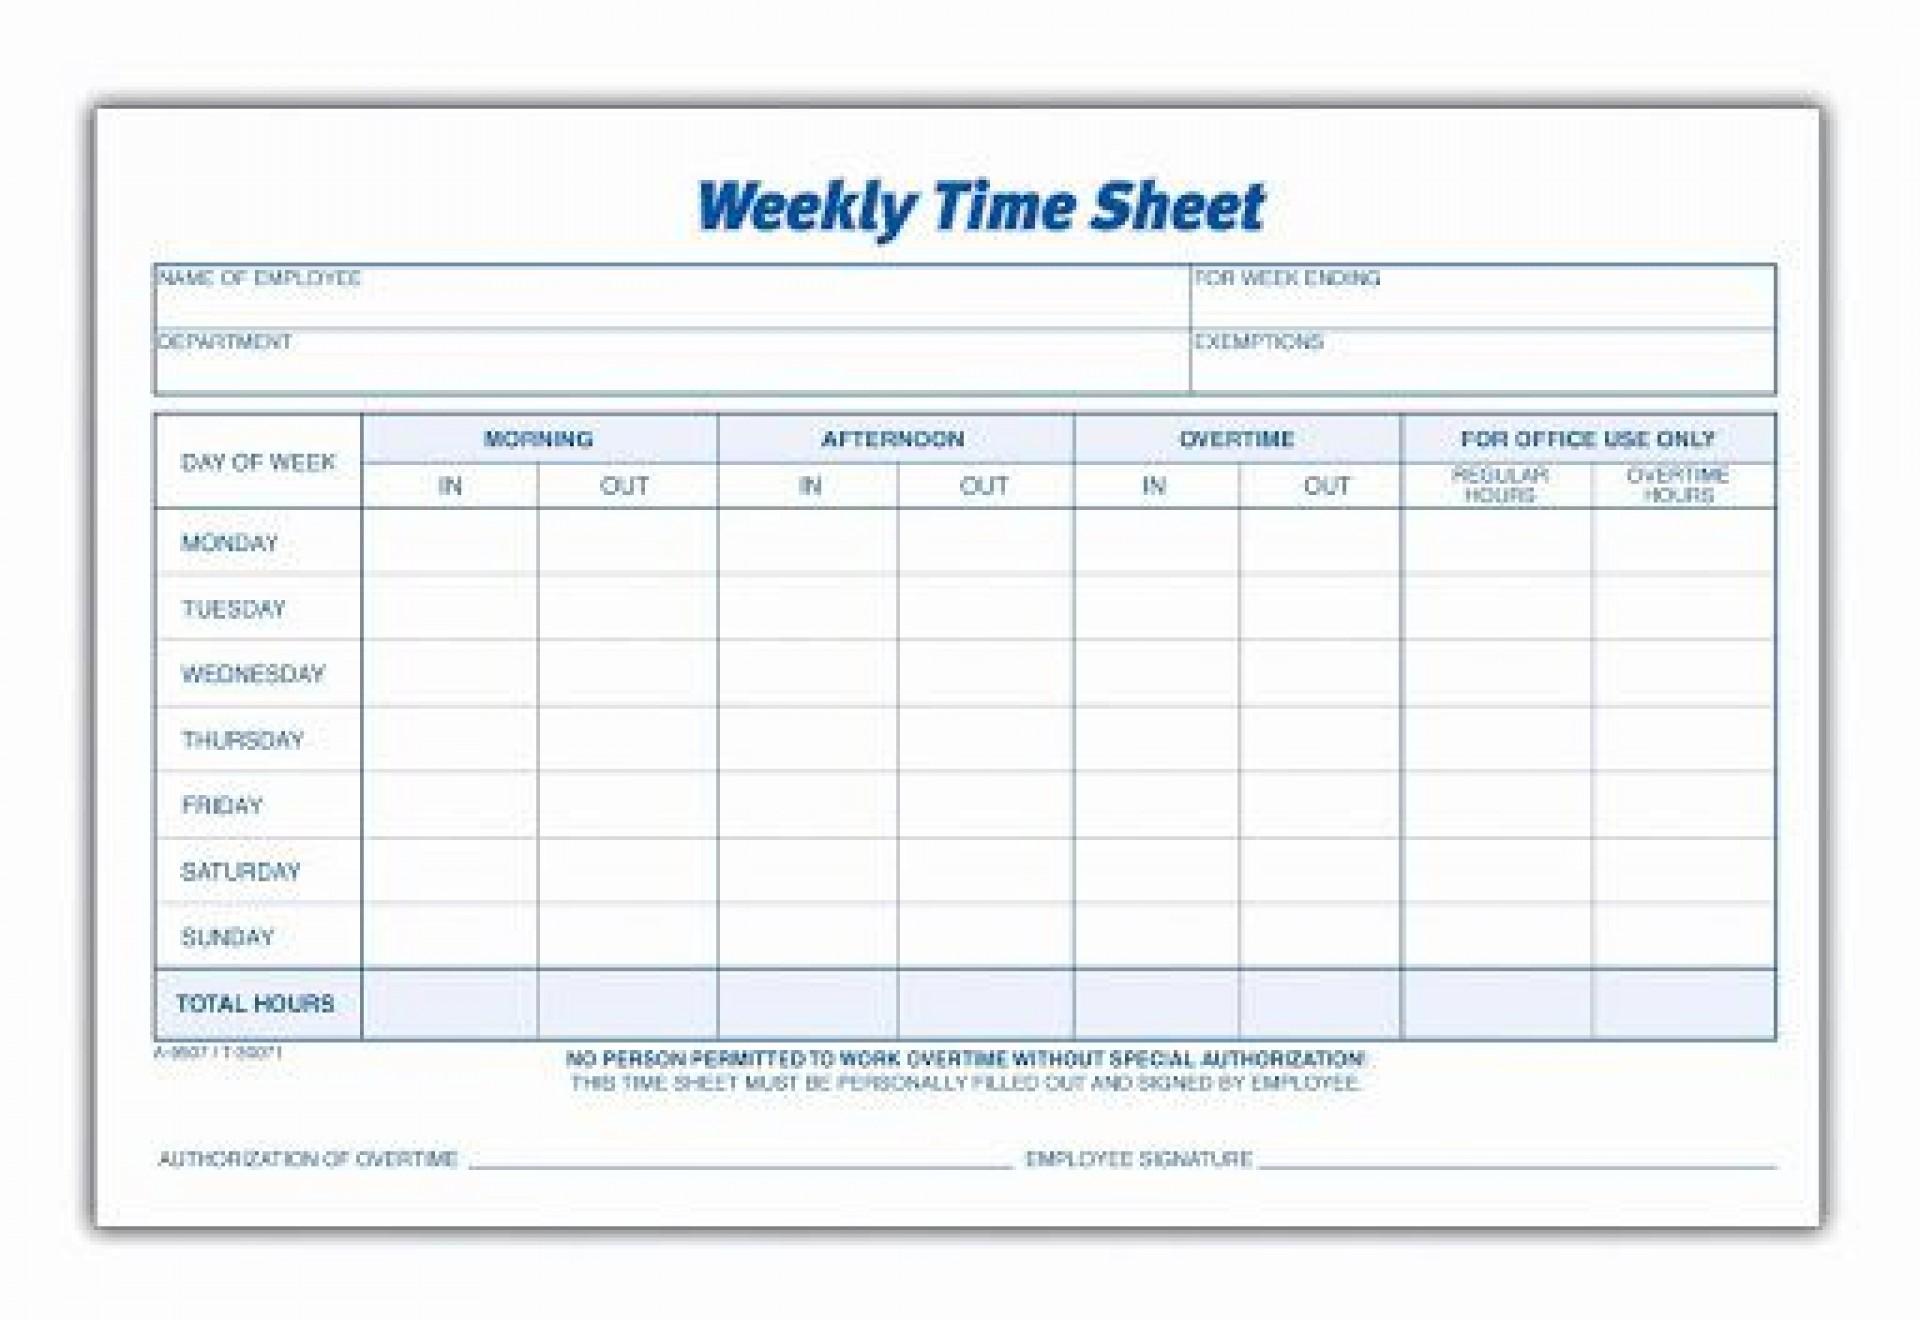 010 Phenomenal Free Employee Sign In Sheet Template Idea  Schedule Pdf Weekly Timesheet Printable1920